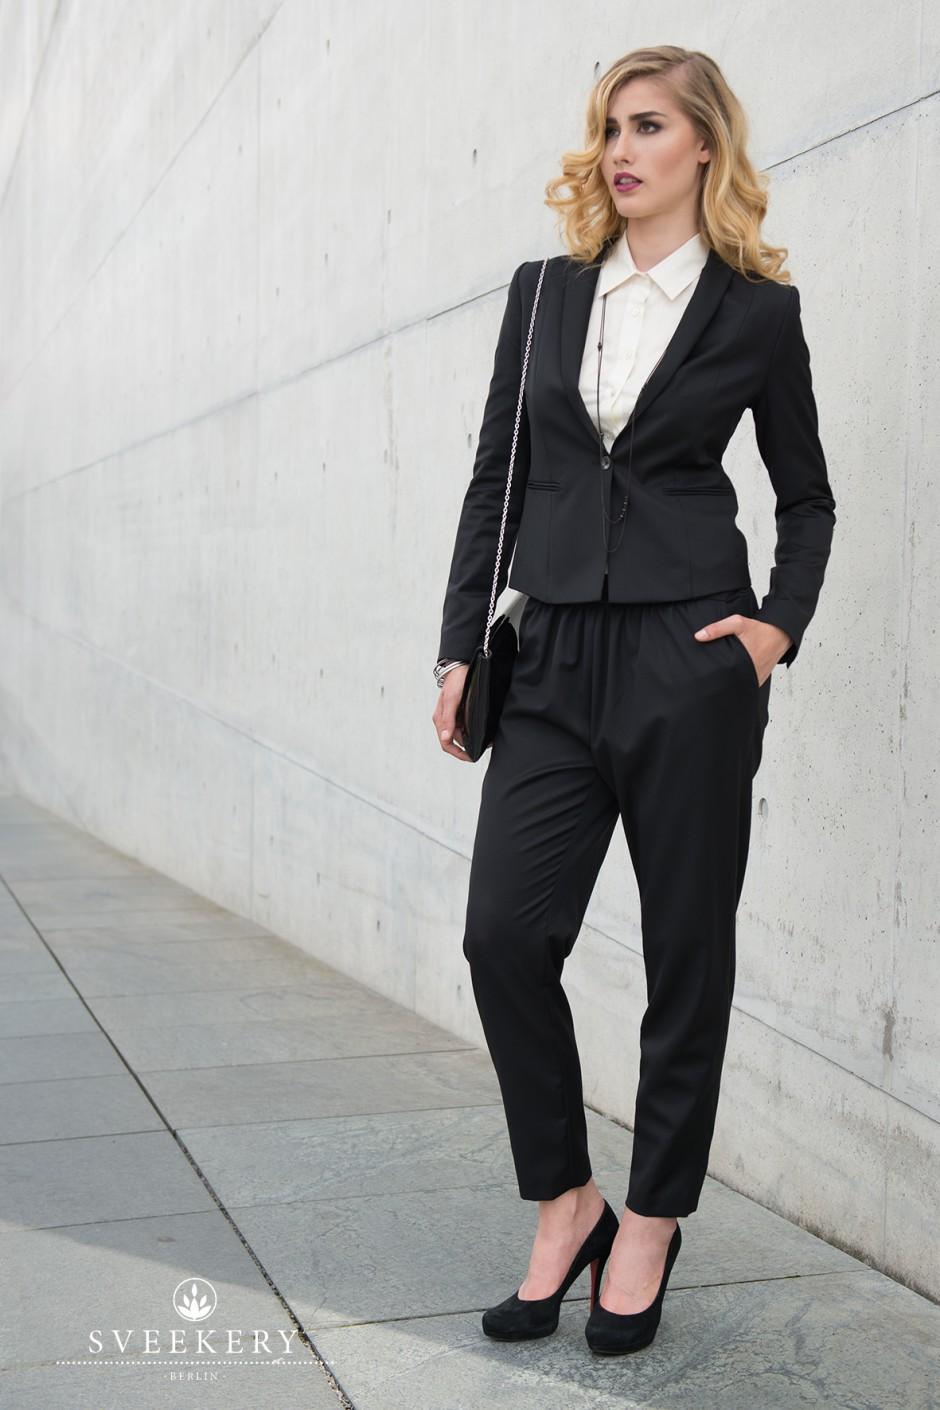 Organic & Ethical Suit Blazer Pants Organic Wool / Bio Blazer Hose Bio-Wolle / Peace Silk Blouse / Bluse aus gewaltfreier Seide